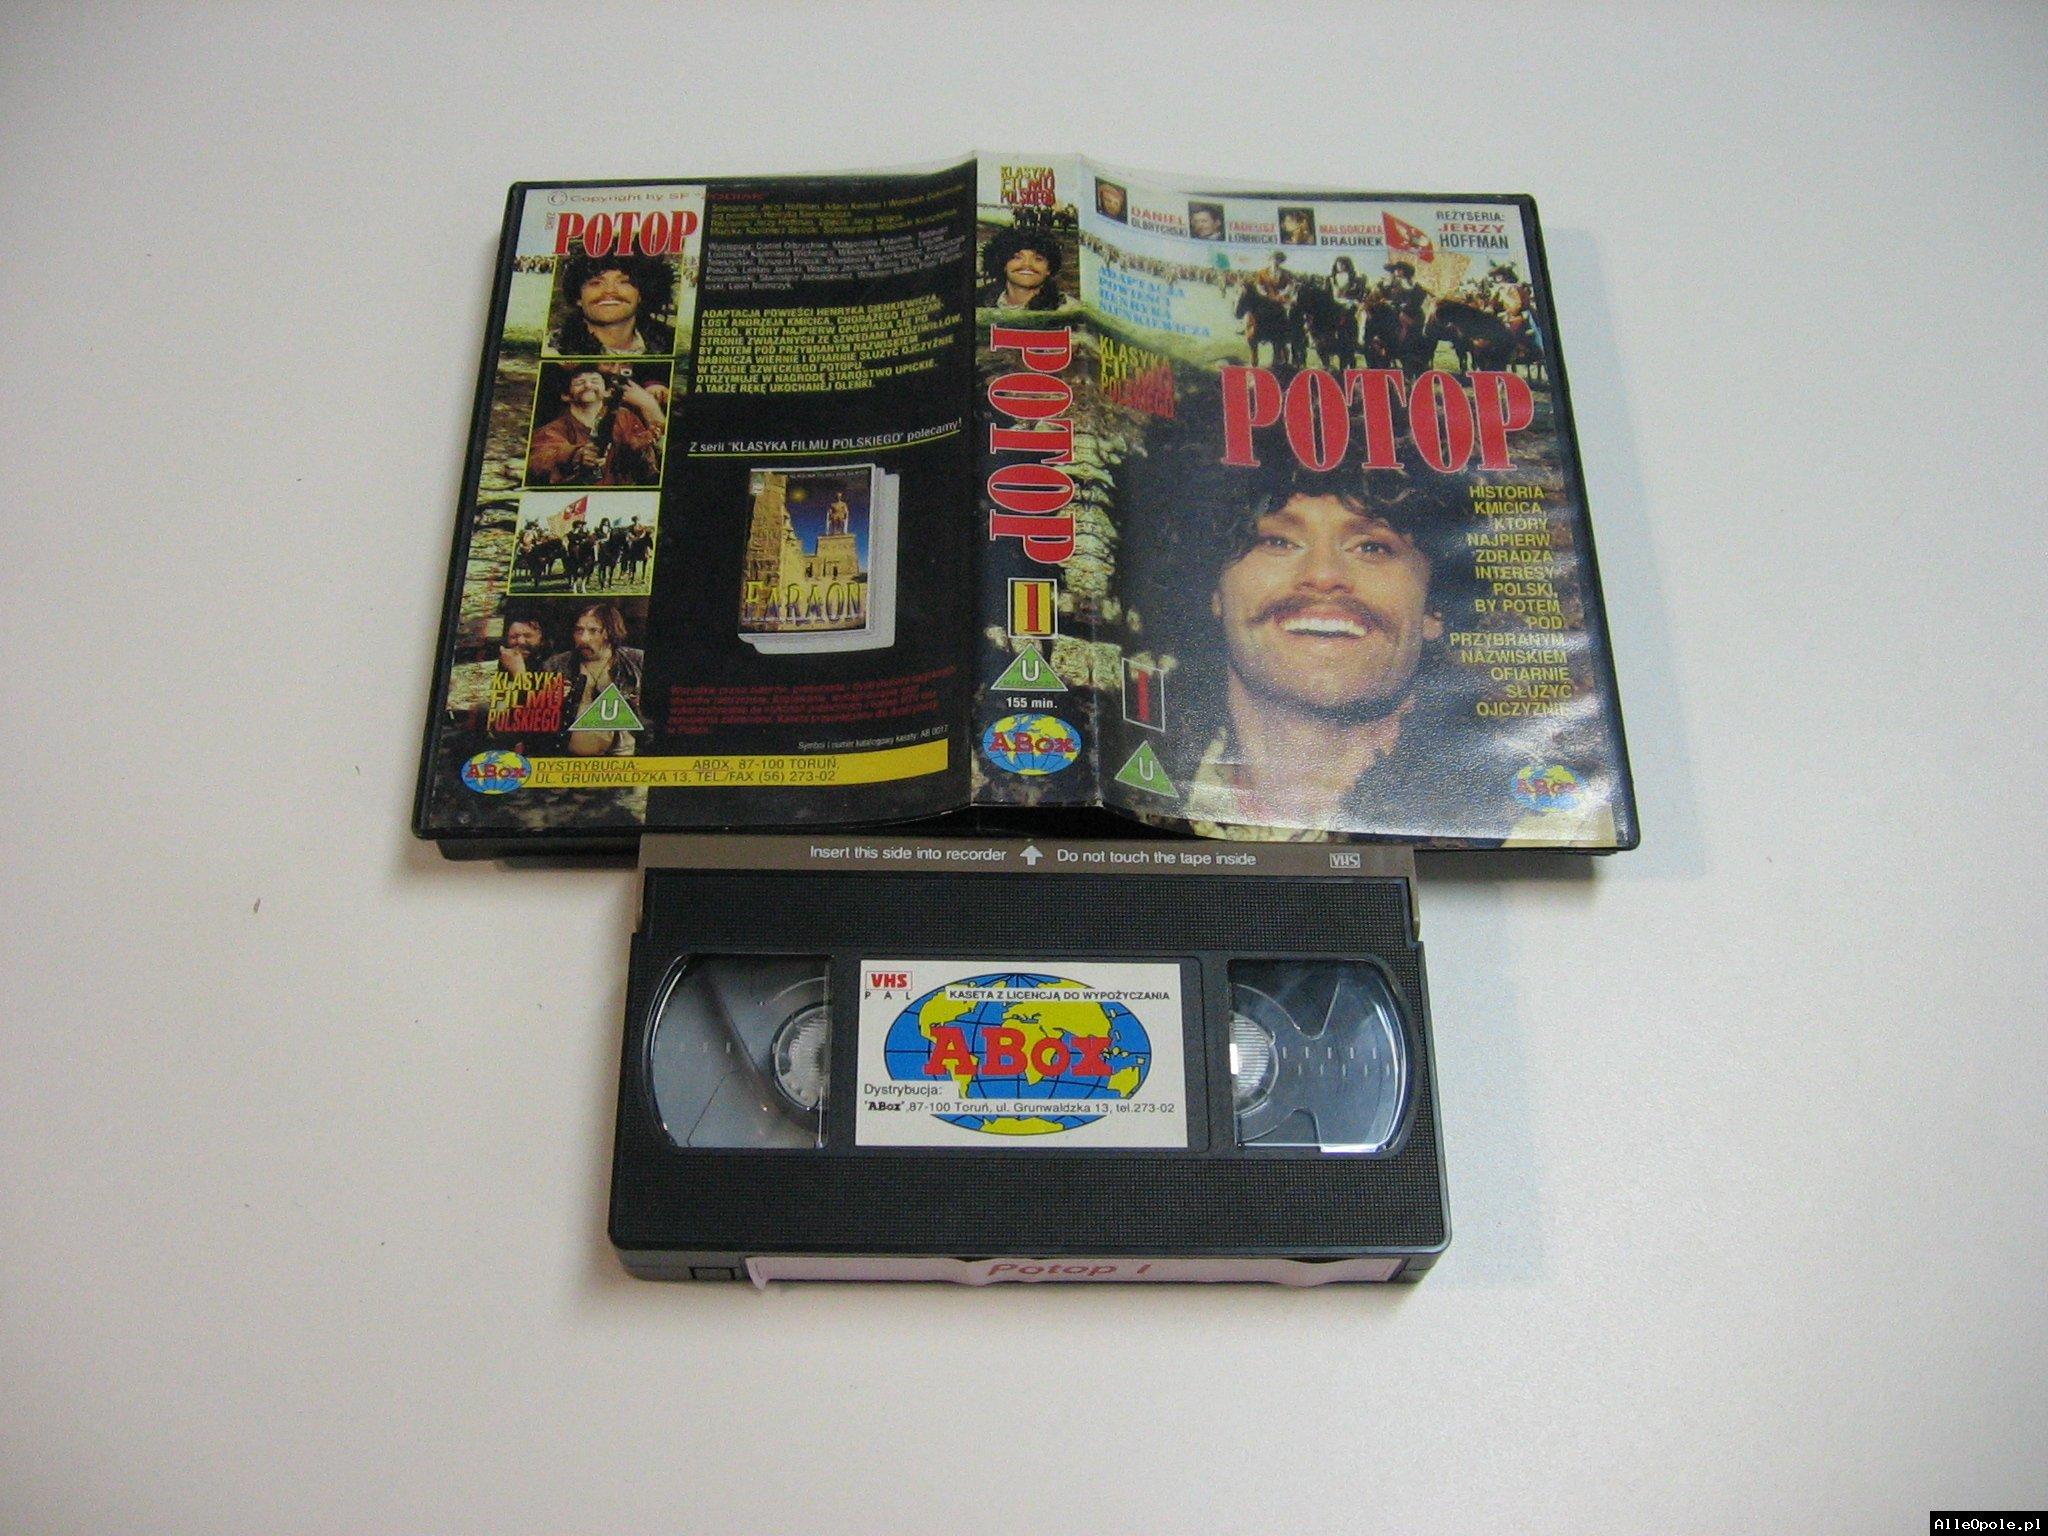 POTOP 1 - VHS Kaseta Video - Opole 1808